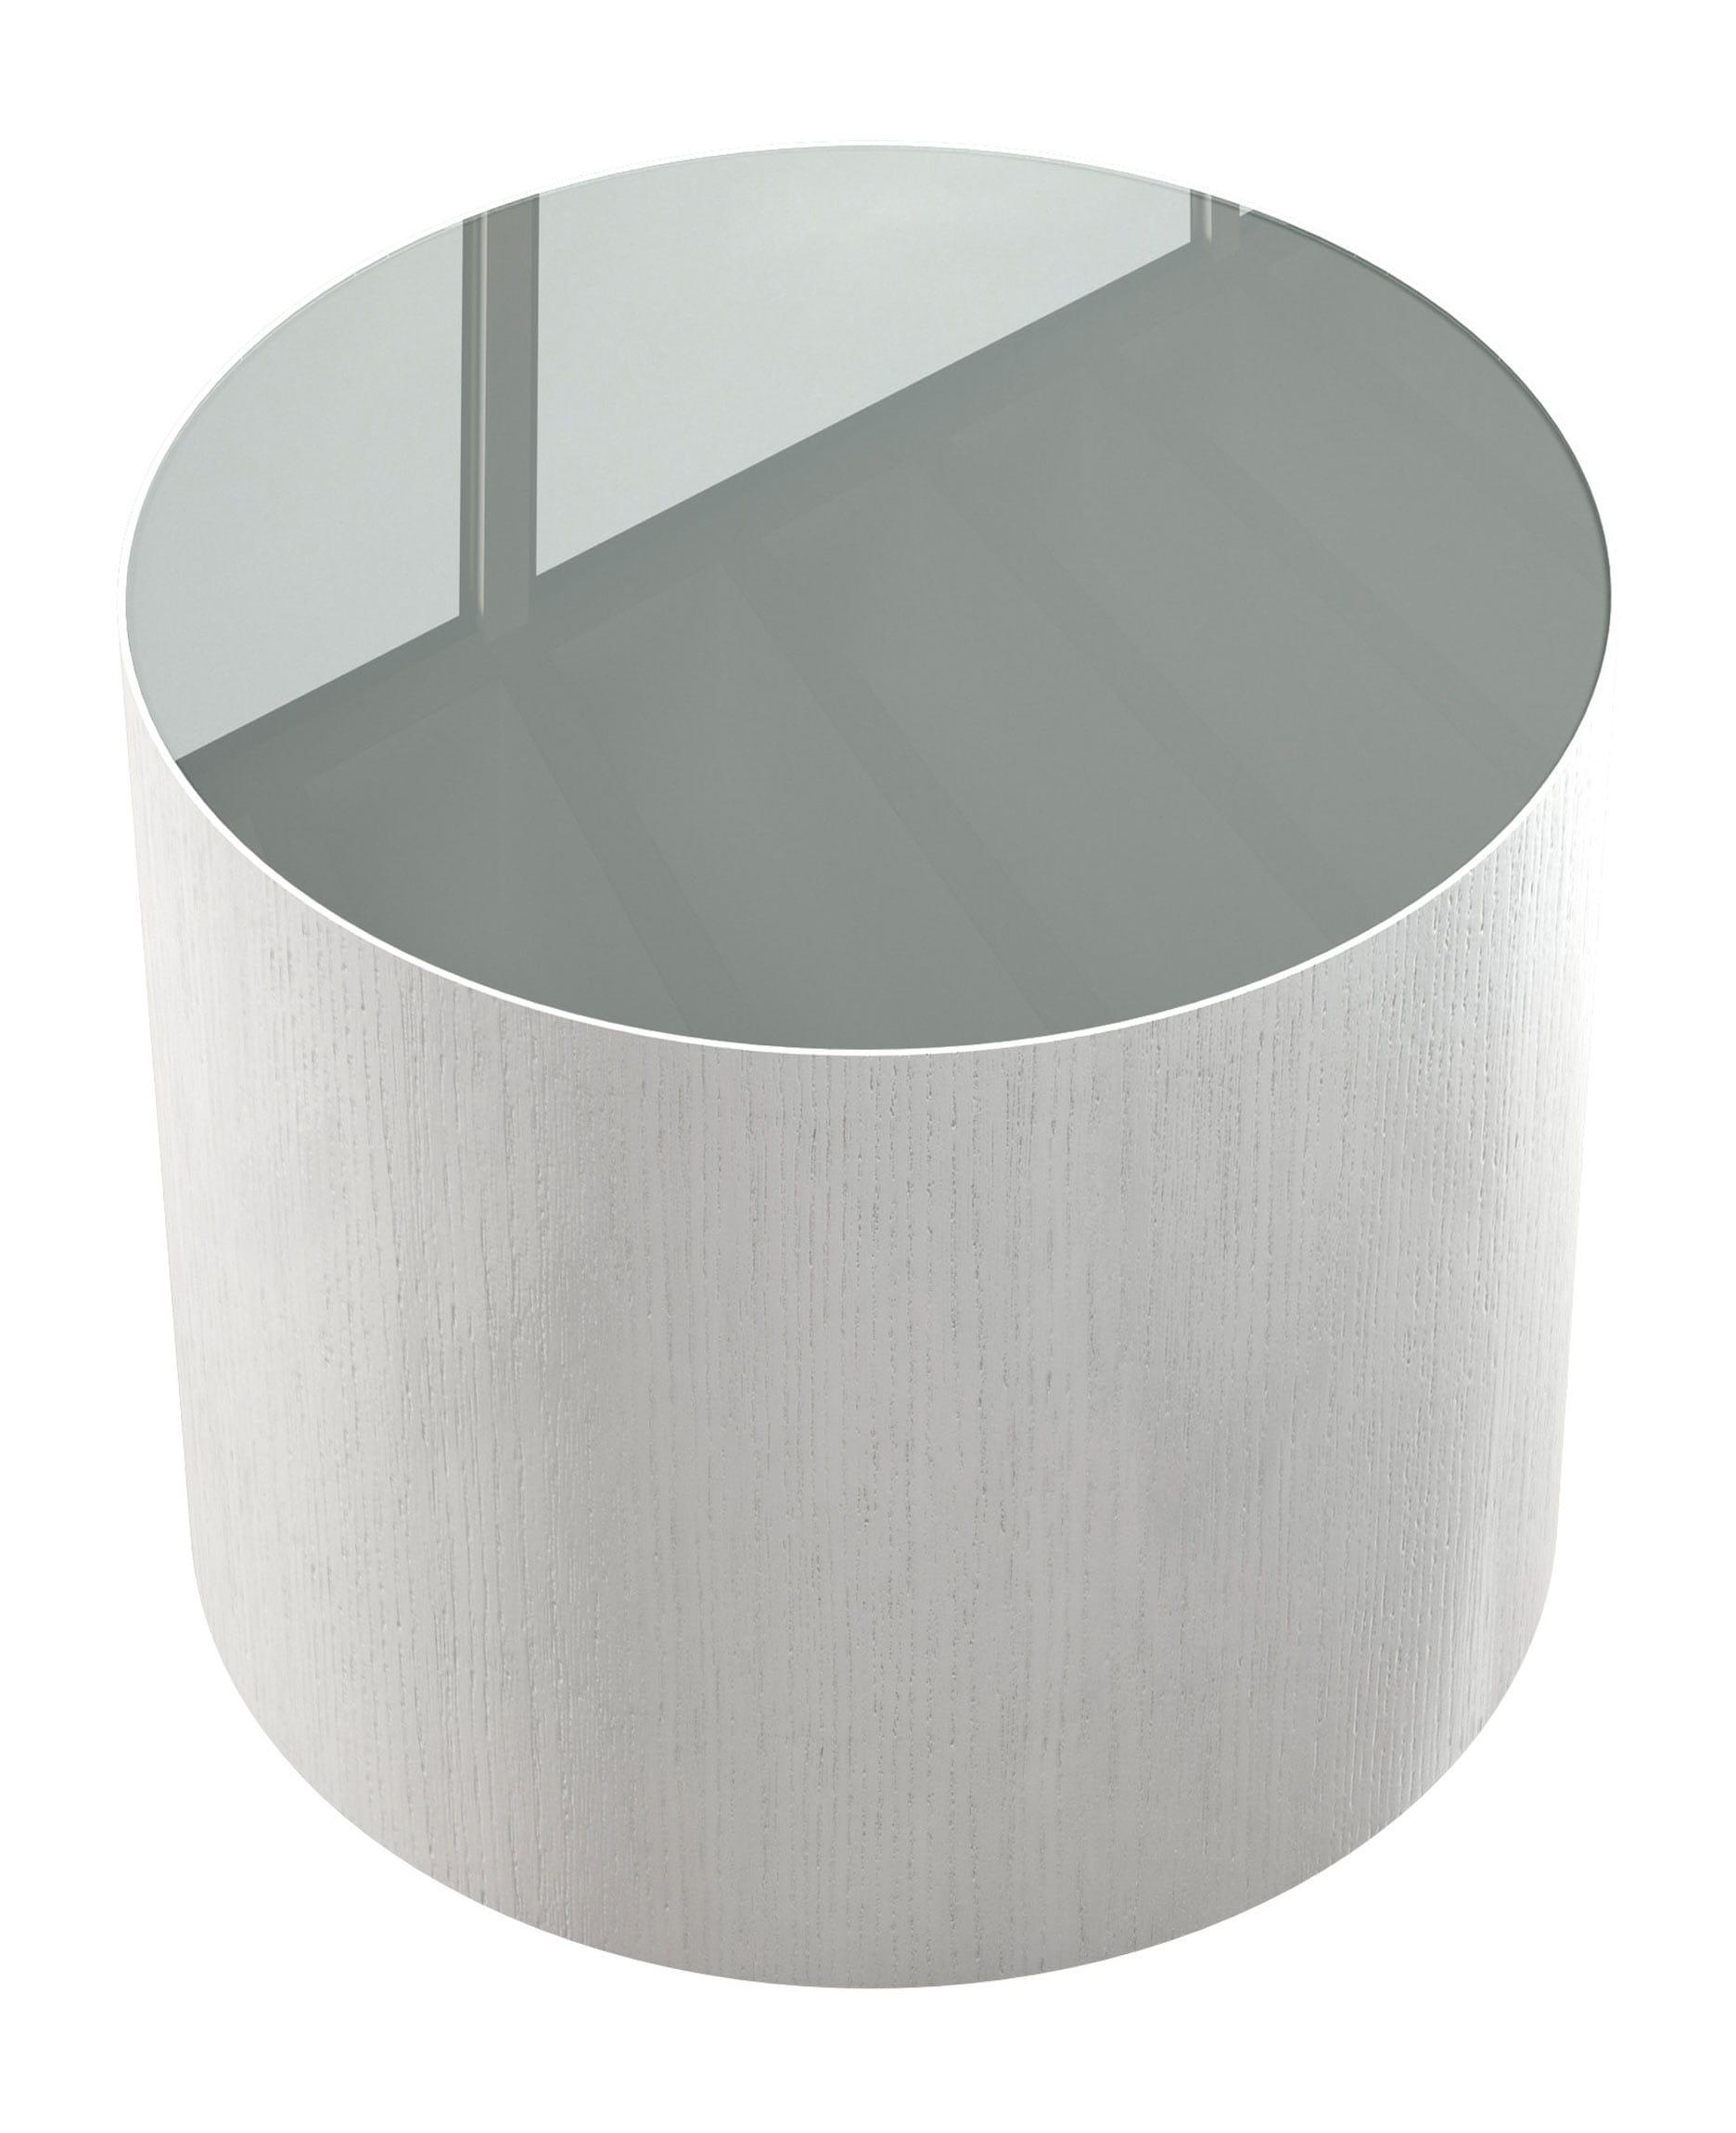 Berkeley Side Table White Glass on White Oak by Modloft